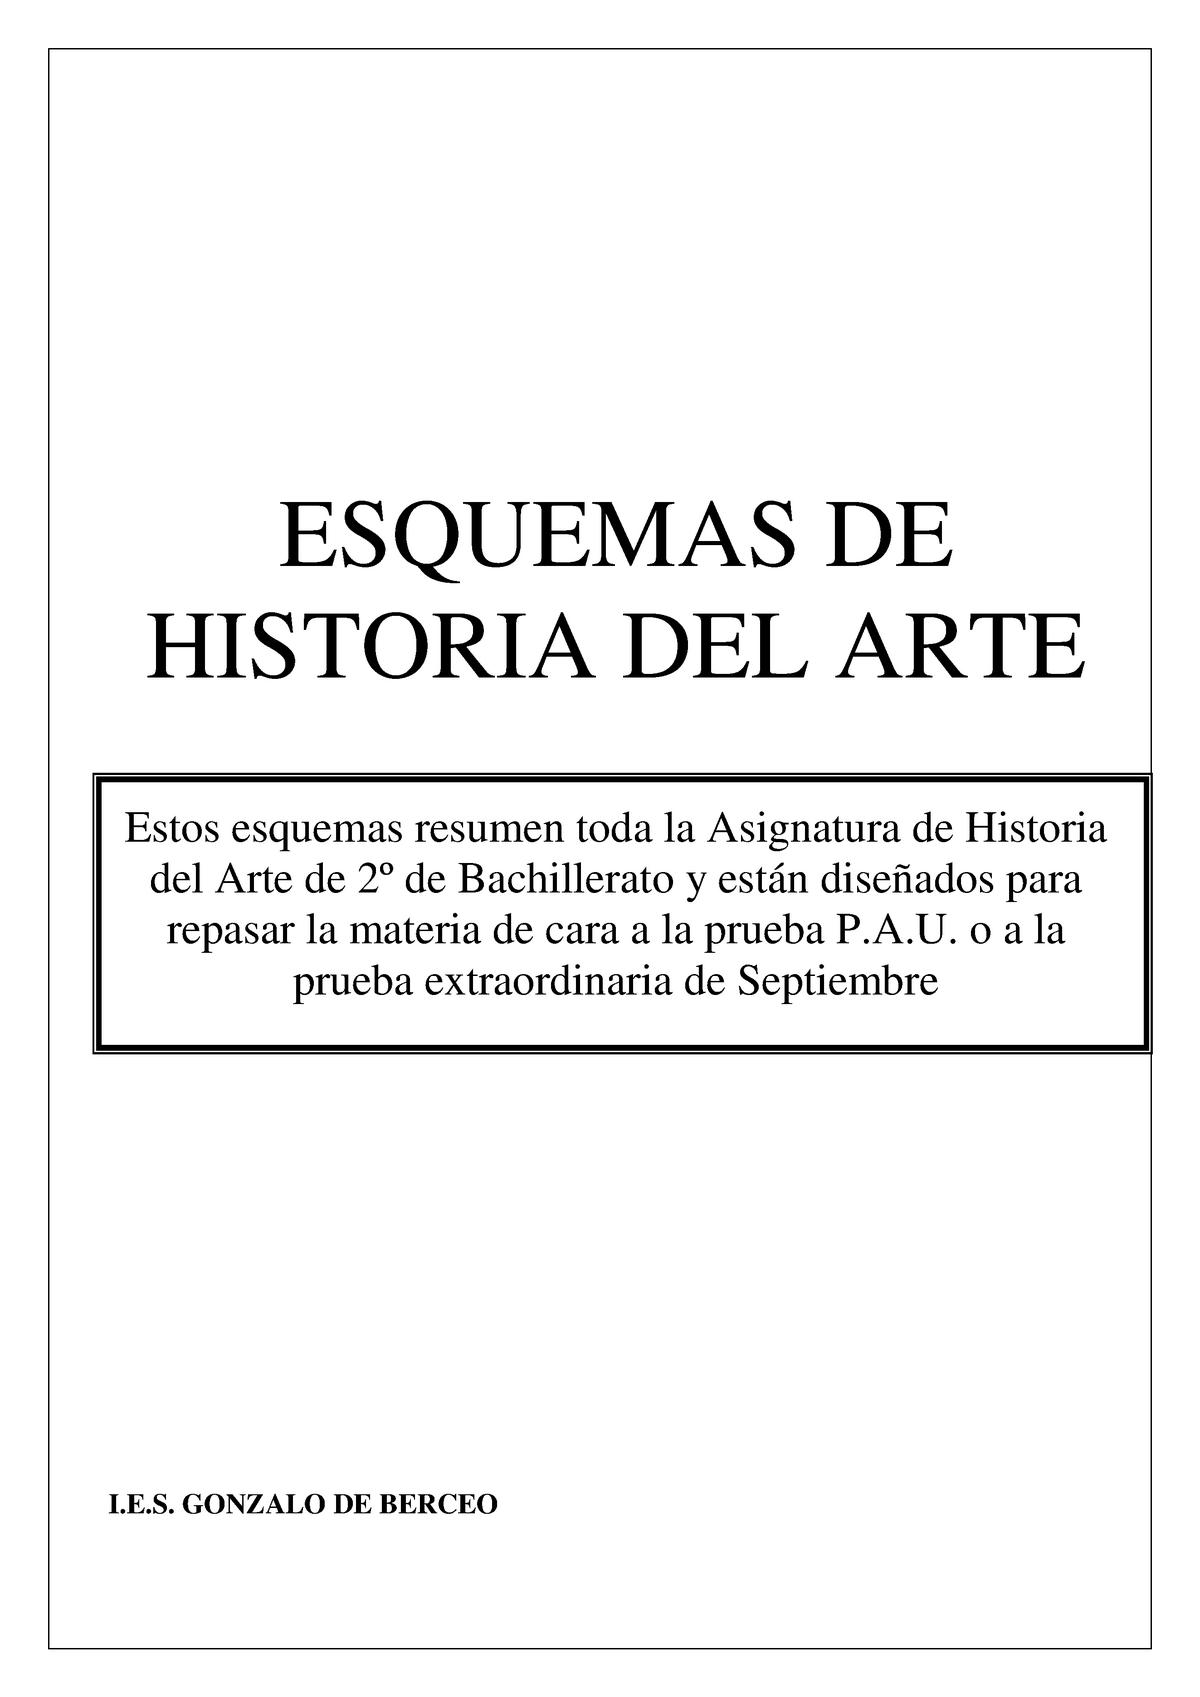 Copia De Esquemas De Historia Del Arte 00223344 Uned